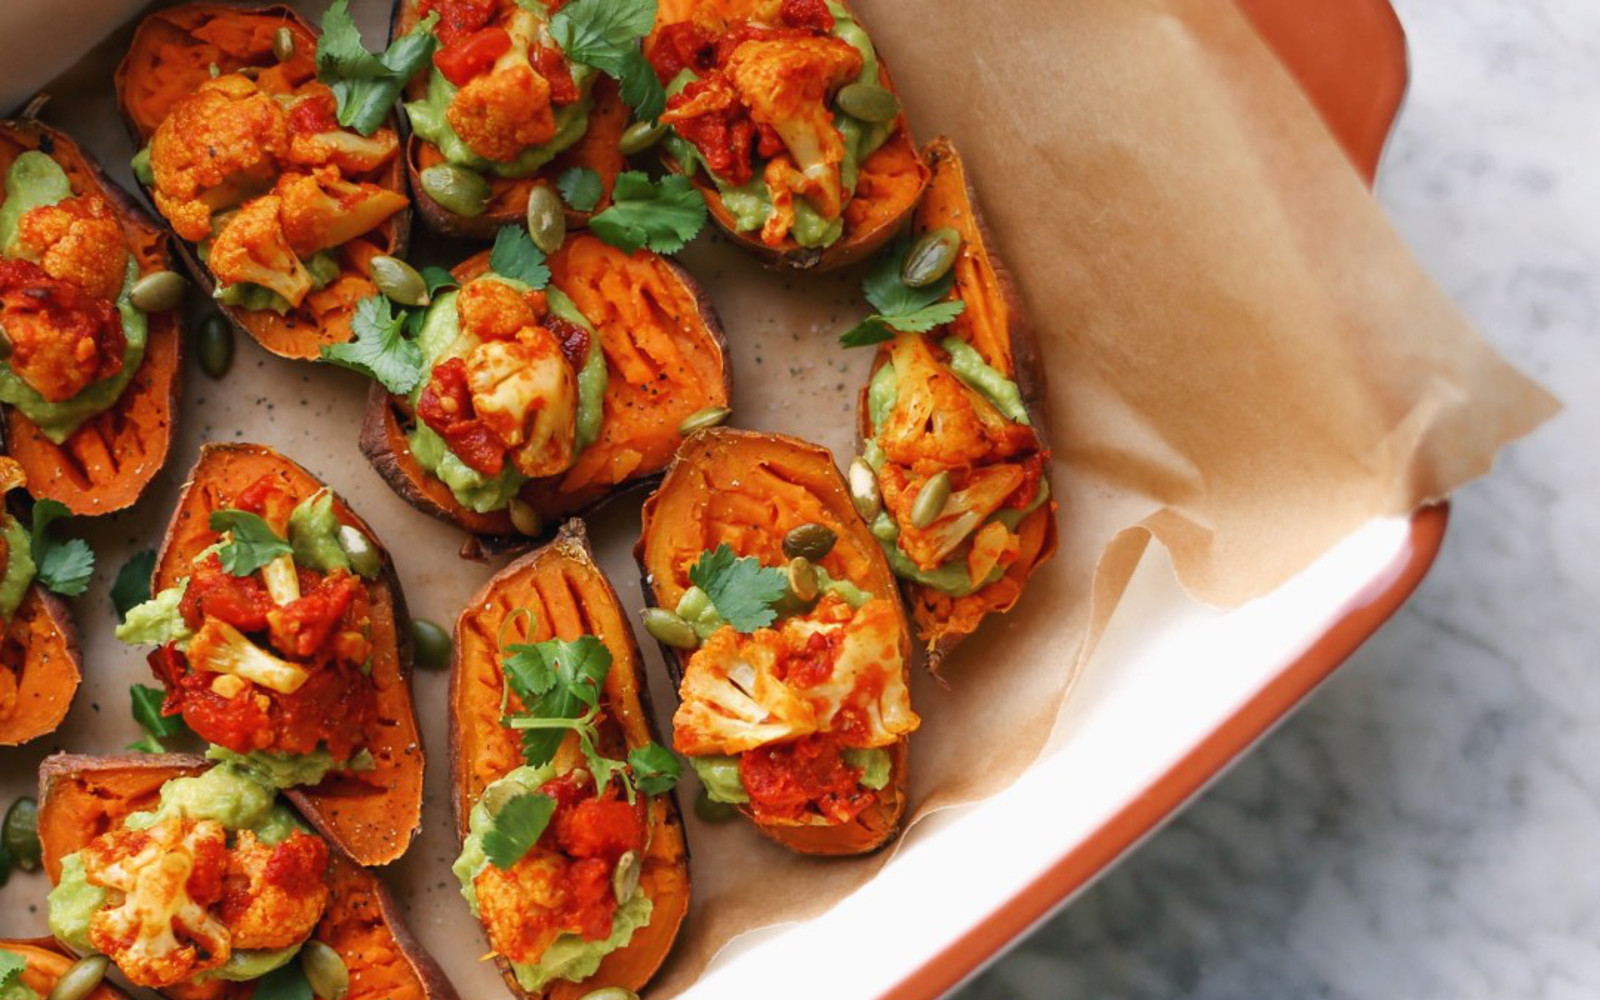 Sweet Potato Bites With Guacamole and Cauliflower